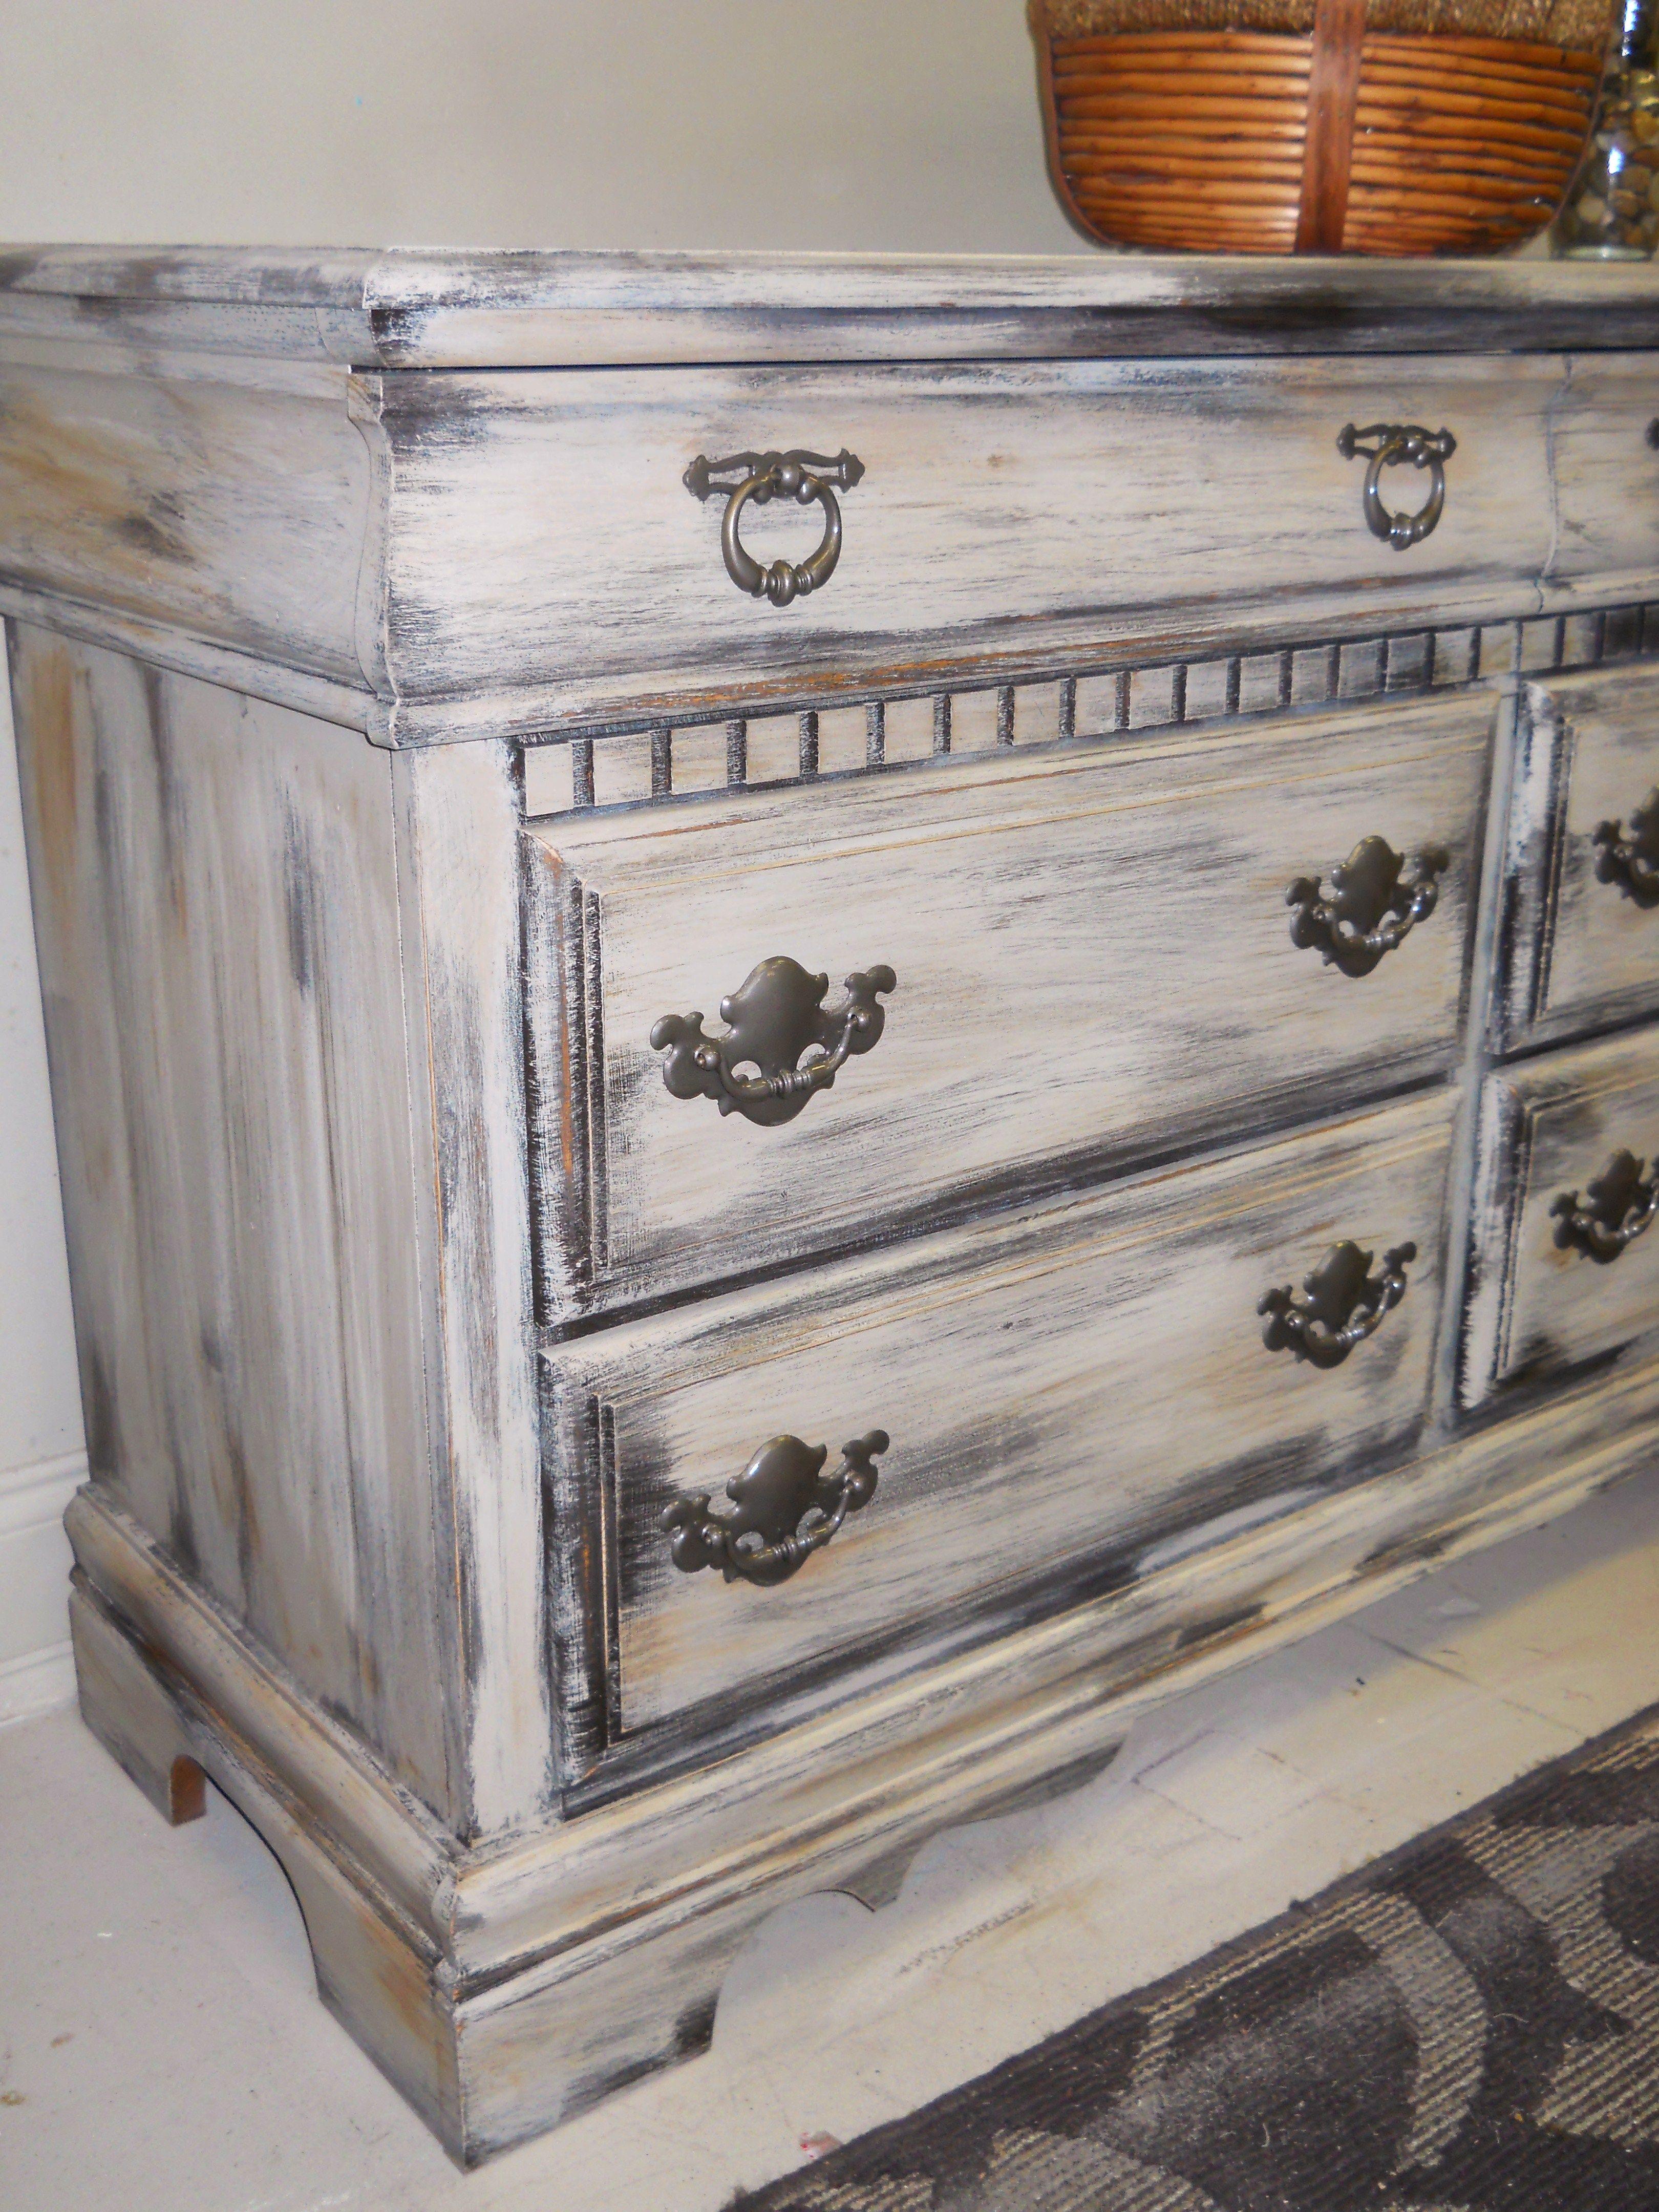 Shabby Chic Dresser Close Up Shabby Chic Dresser Shabby Chic Cabinet Rustic Dresser